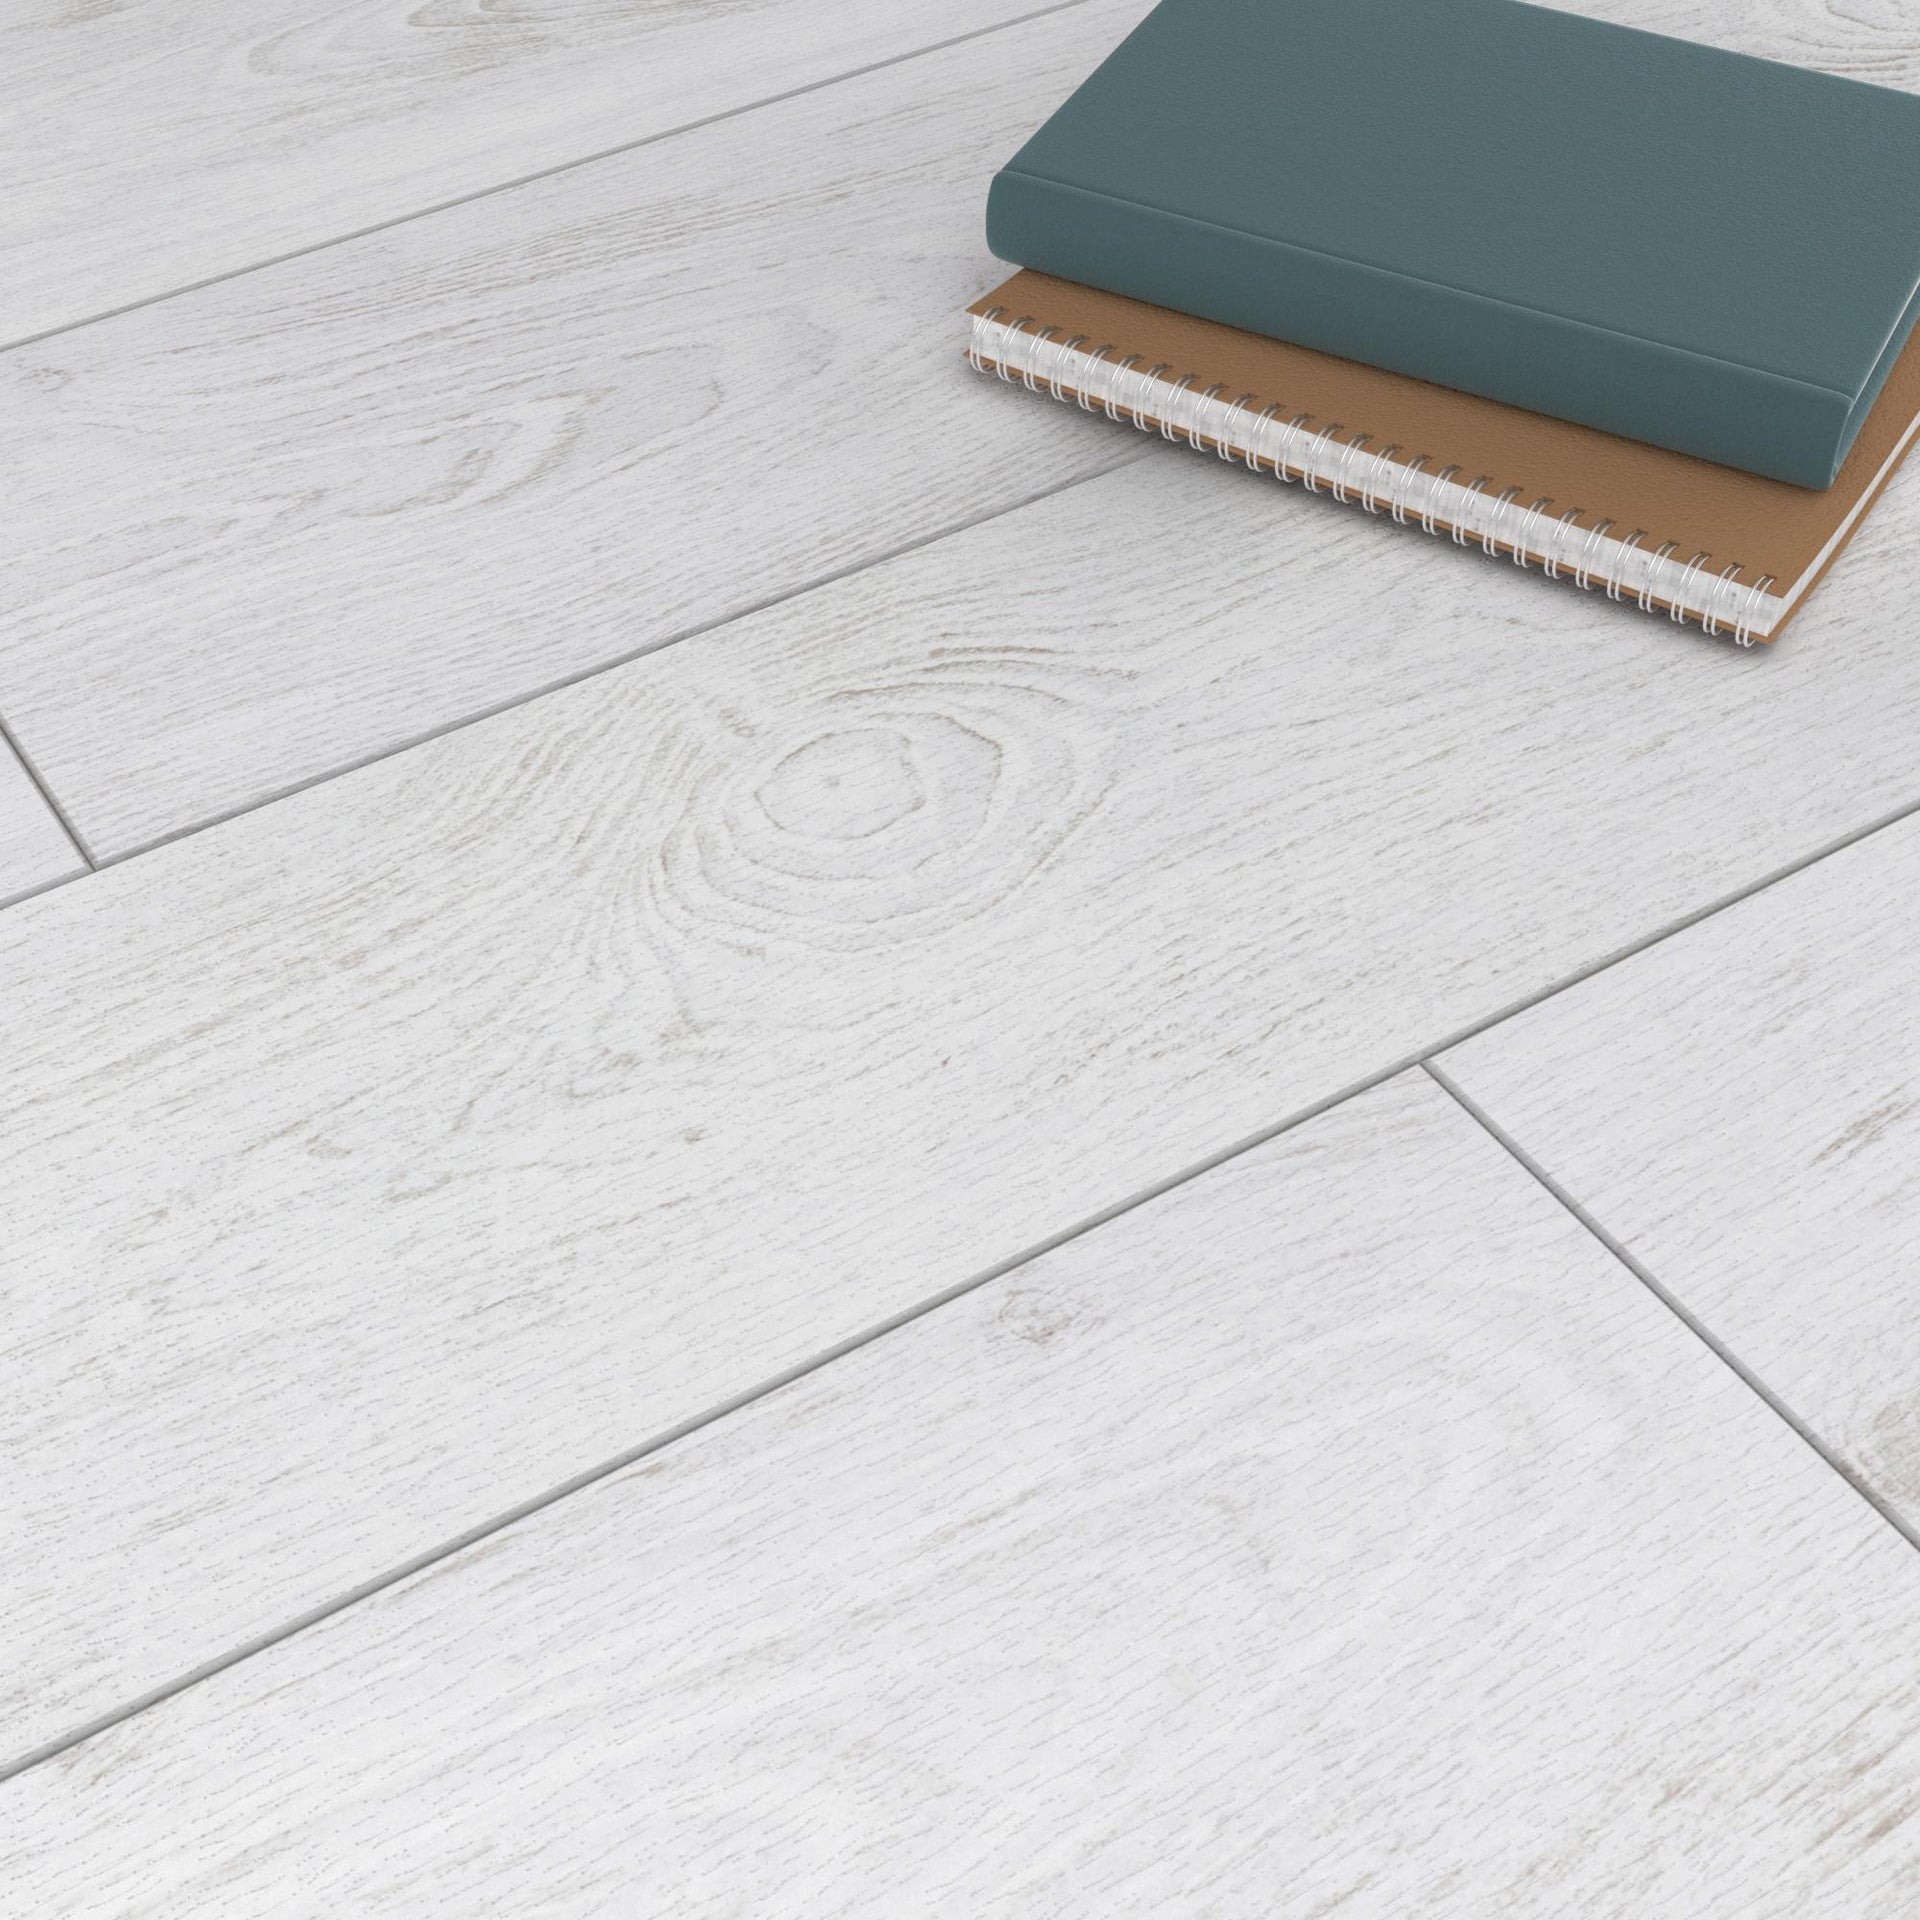 Pavimento laminato Nuiza Sp 8 mm beige - 2